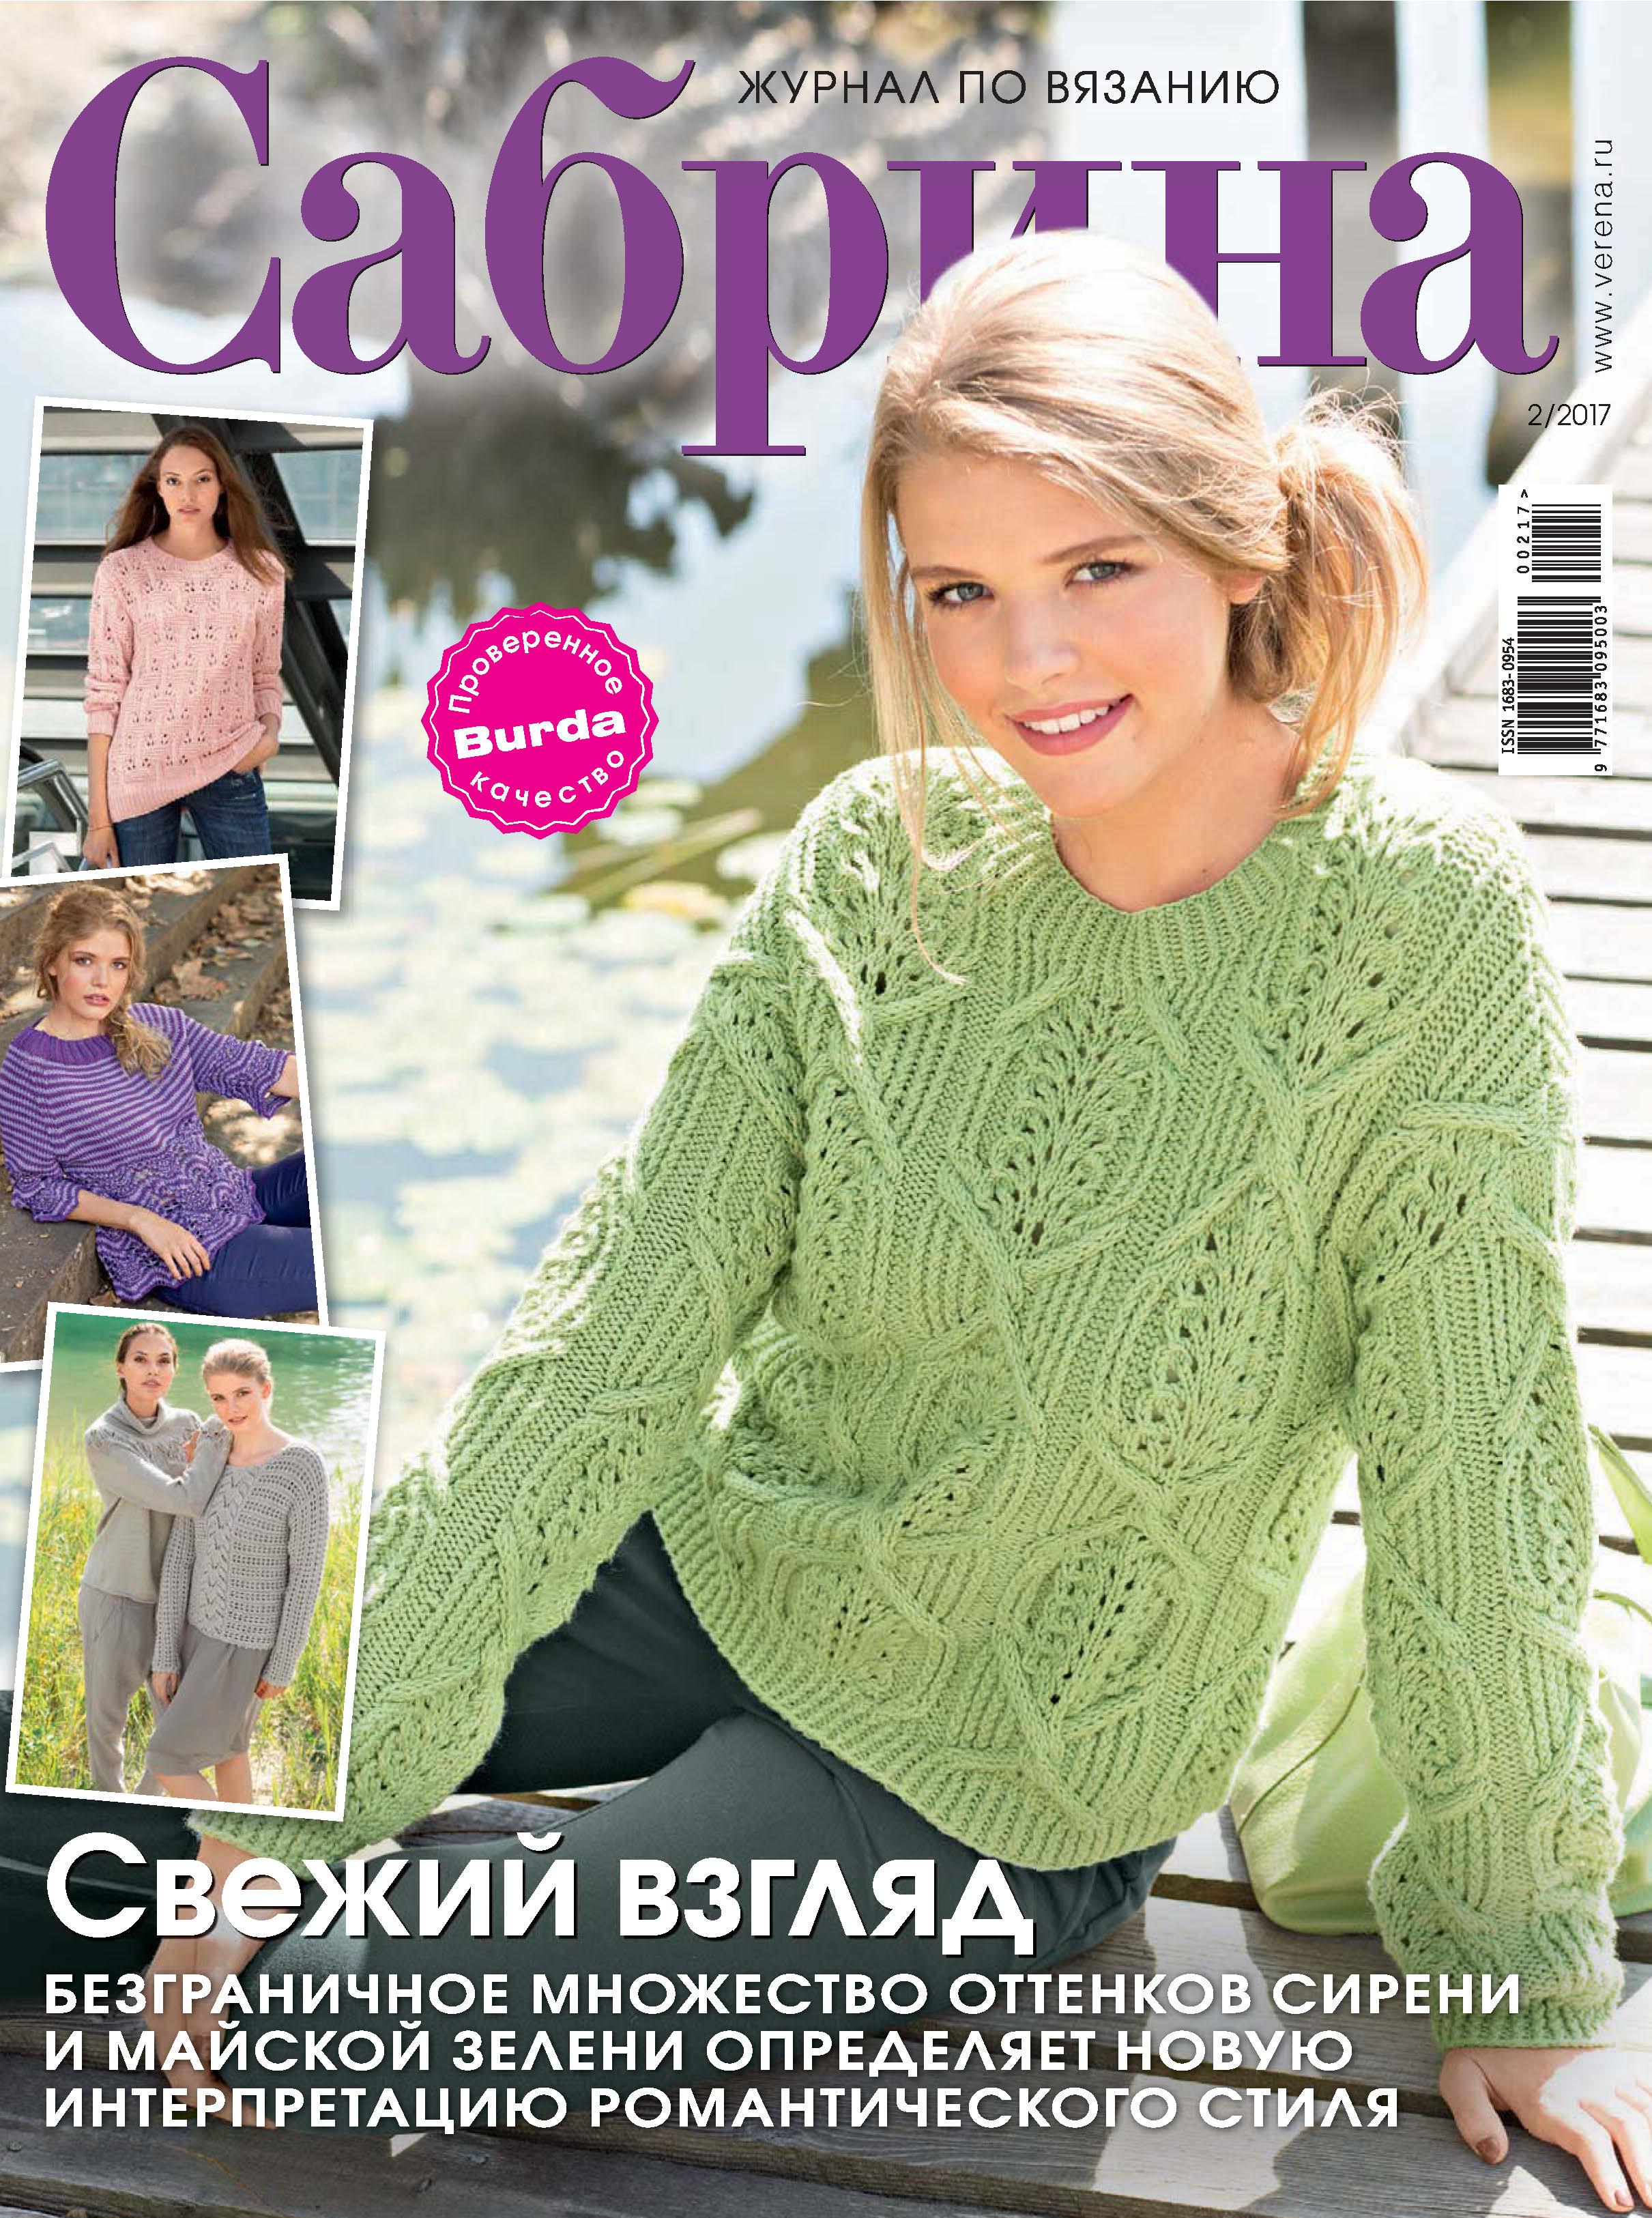 ИД «Бурда» Сабрина. Журнал по вязанию. №02/2017